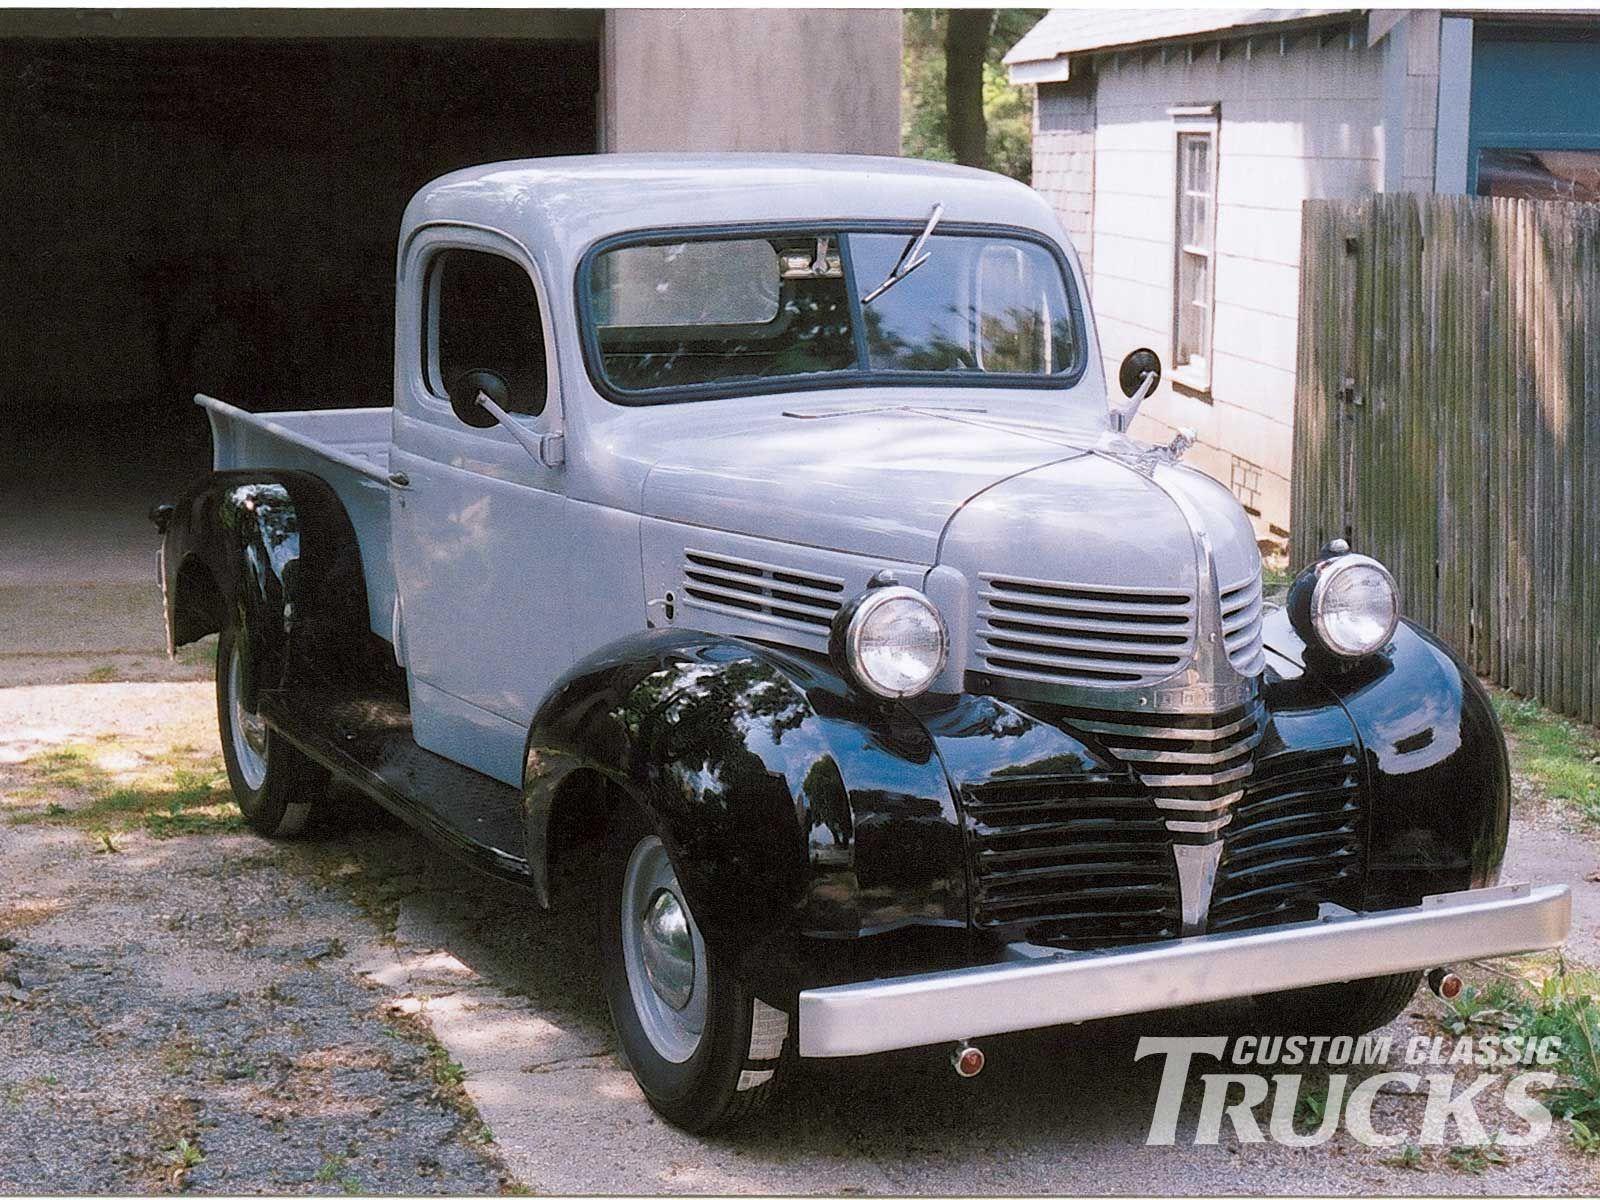 1940 Dodge Truck Readers Trucks Old Dodge Trucks Classic Cars Trucks Classic Pickup Trucks